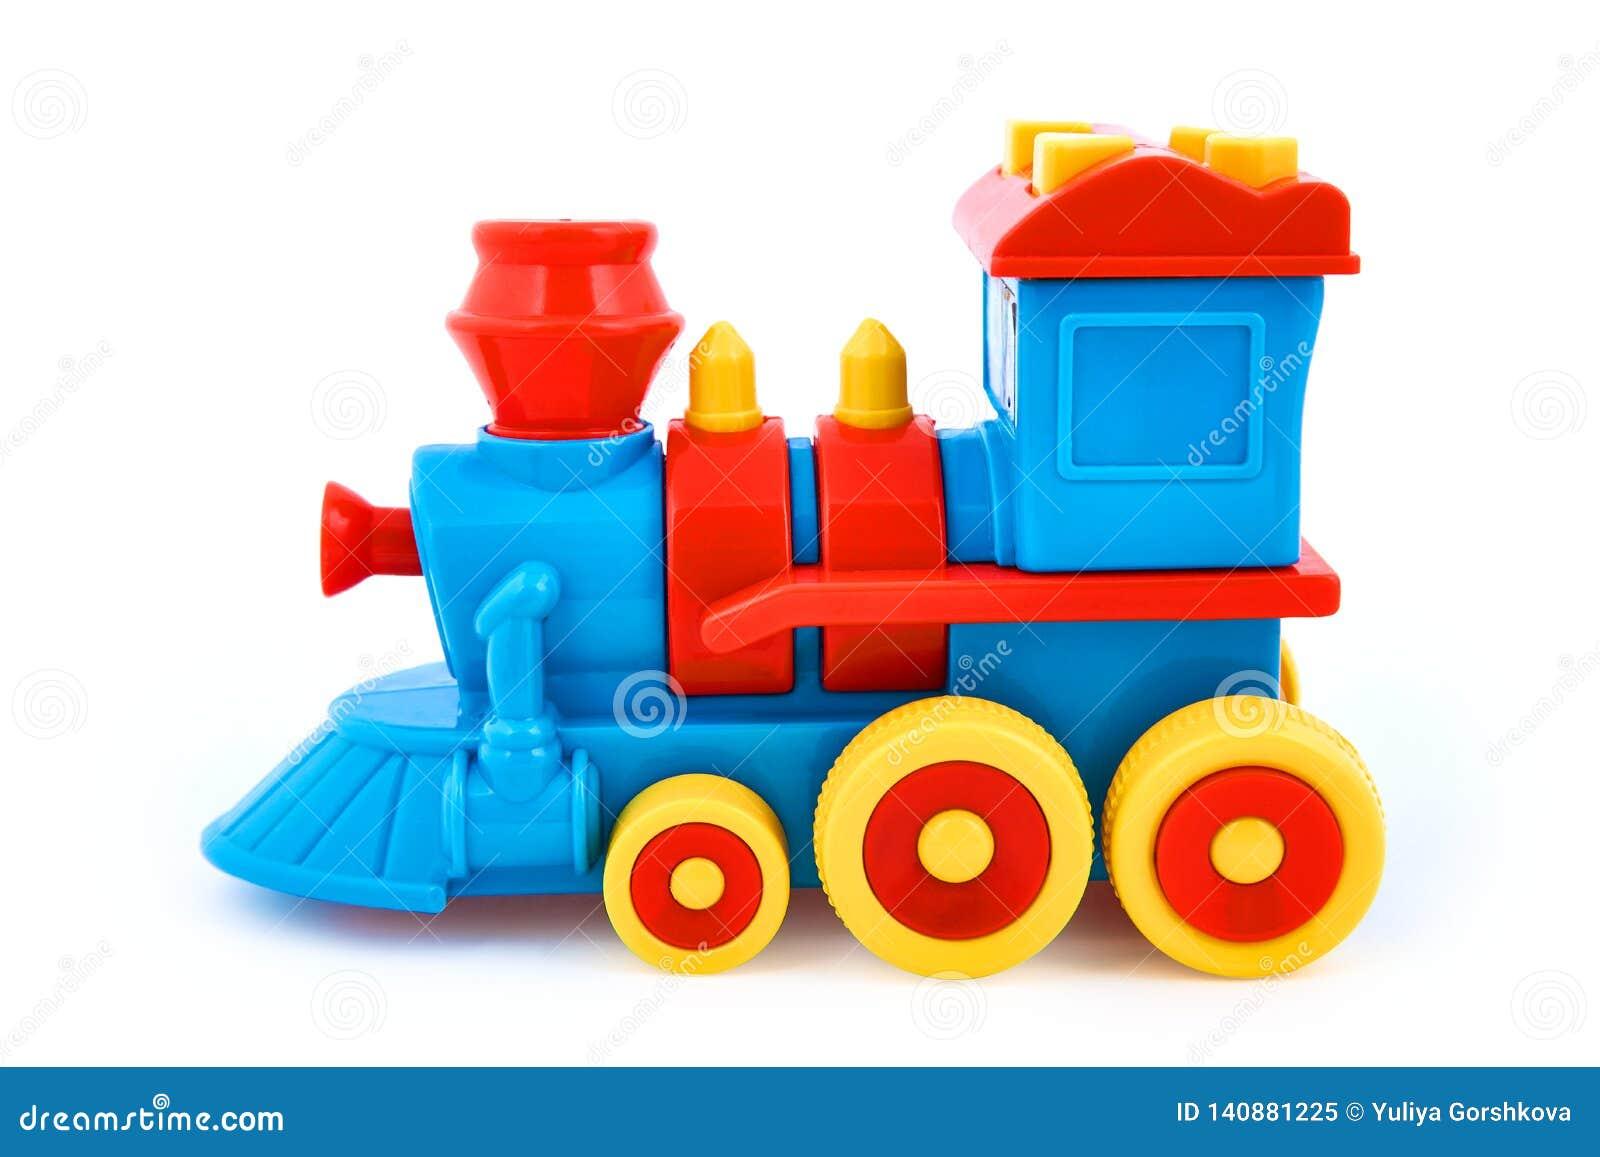 Plastic children`s toy locomotive isolated on white background